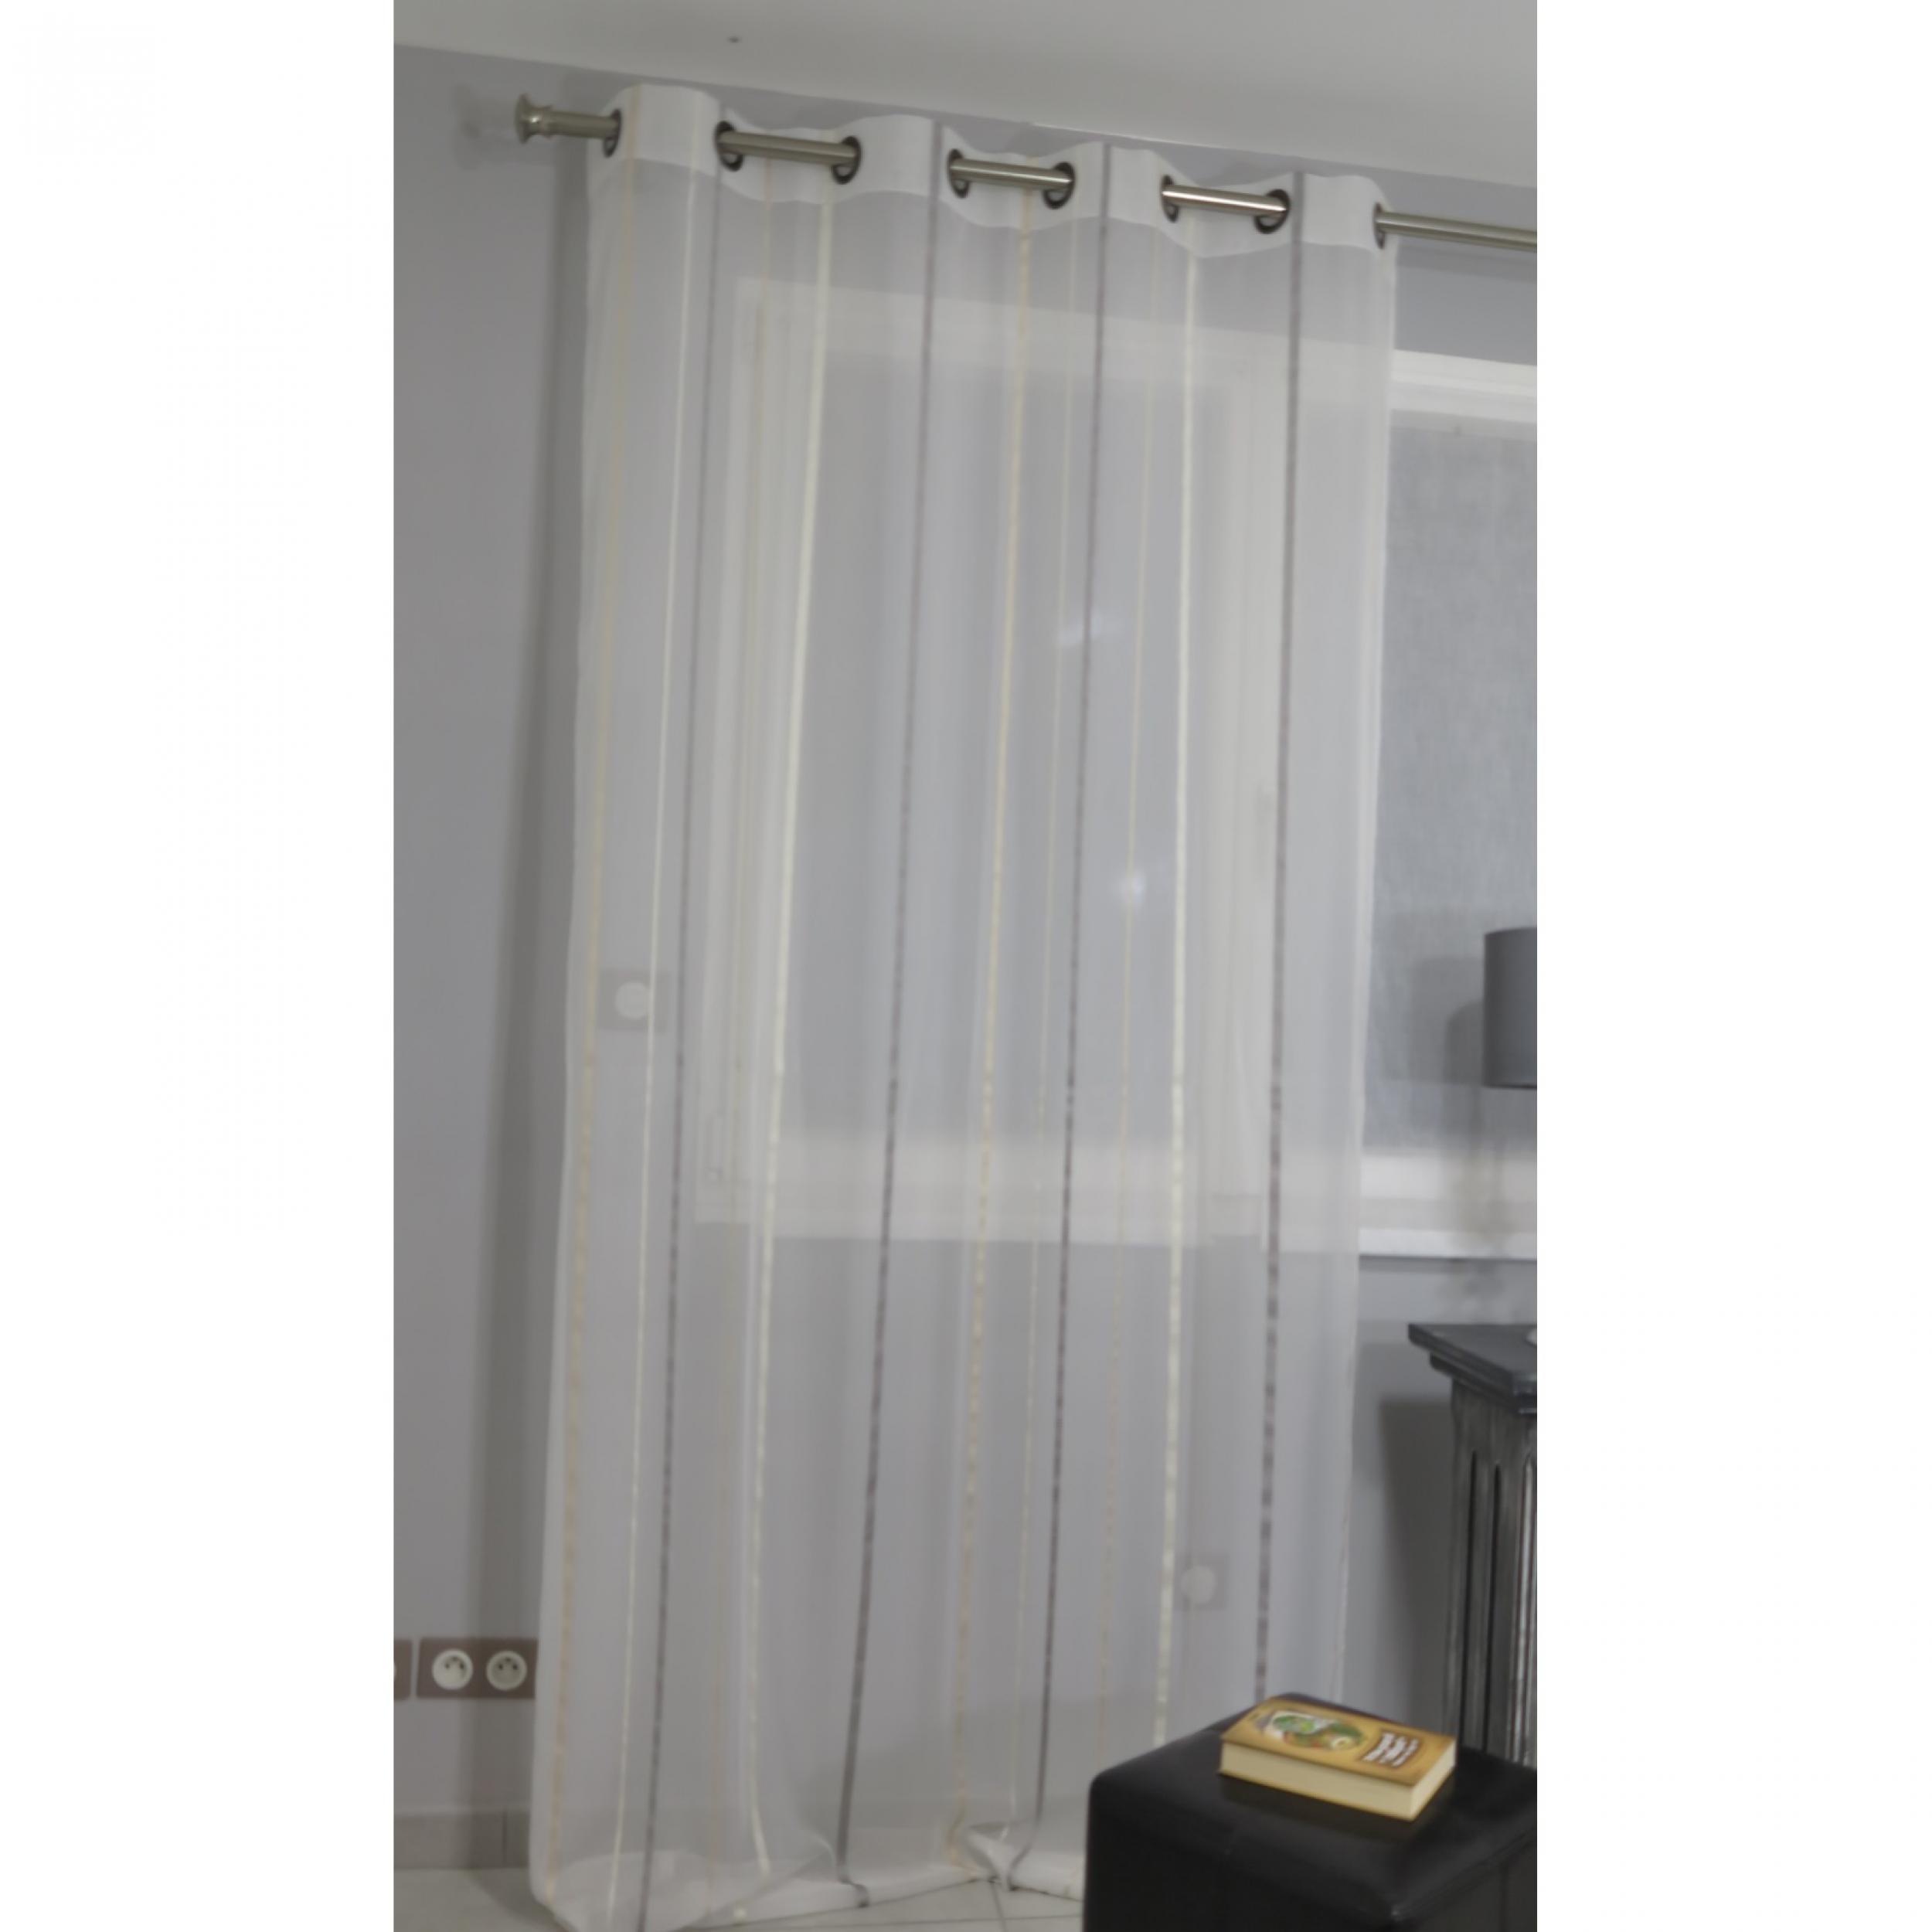 rideaux pret a poser rideau pret a poser 425148 rideaux prets a poser rideaux pr t poser lin. Black Bedroom Furniture Sets. Home Design Ideas